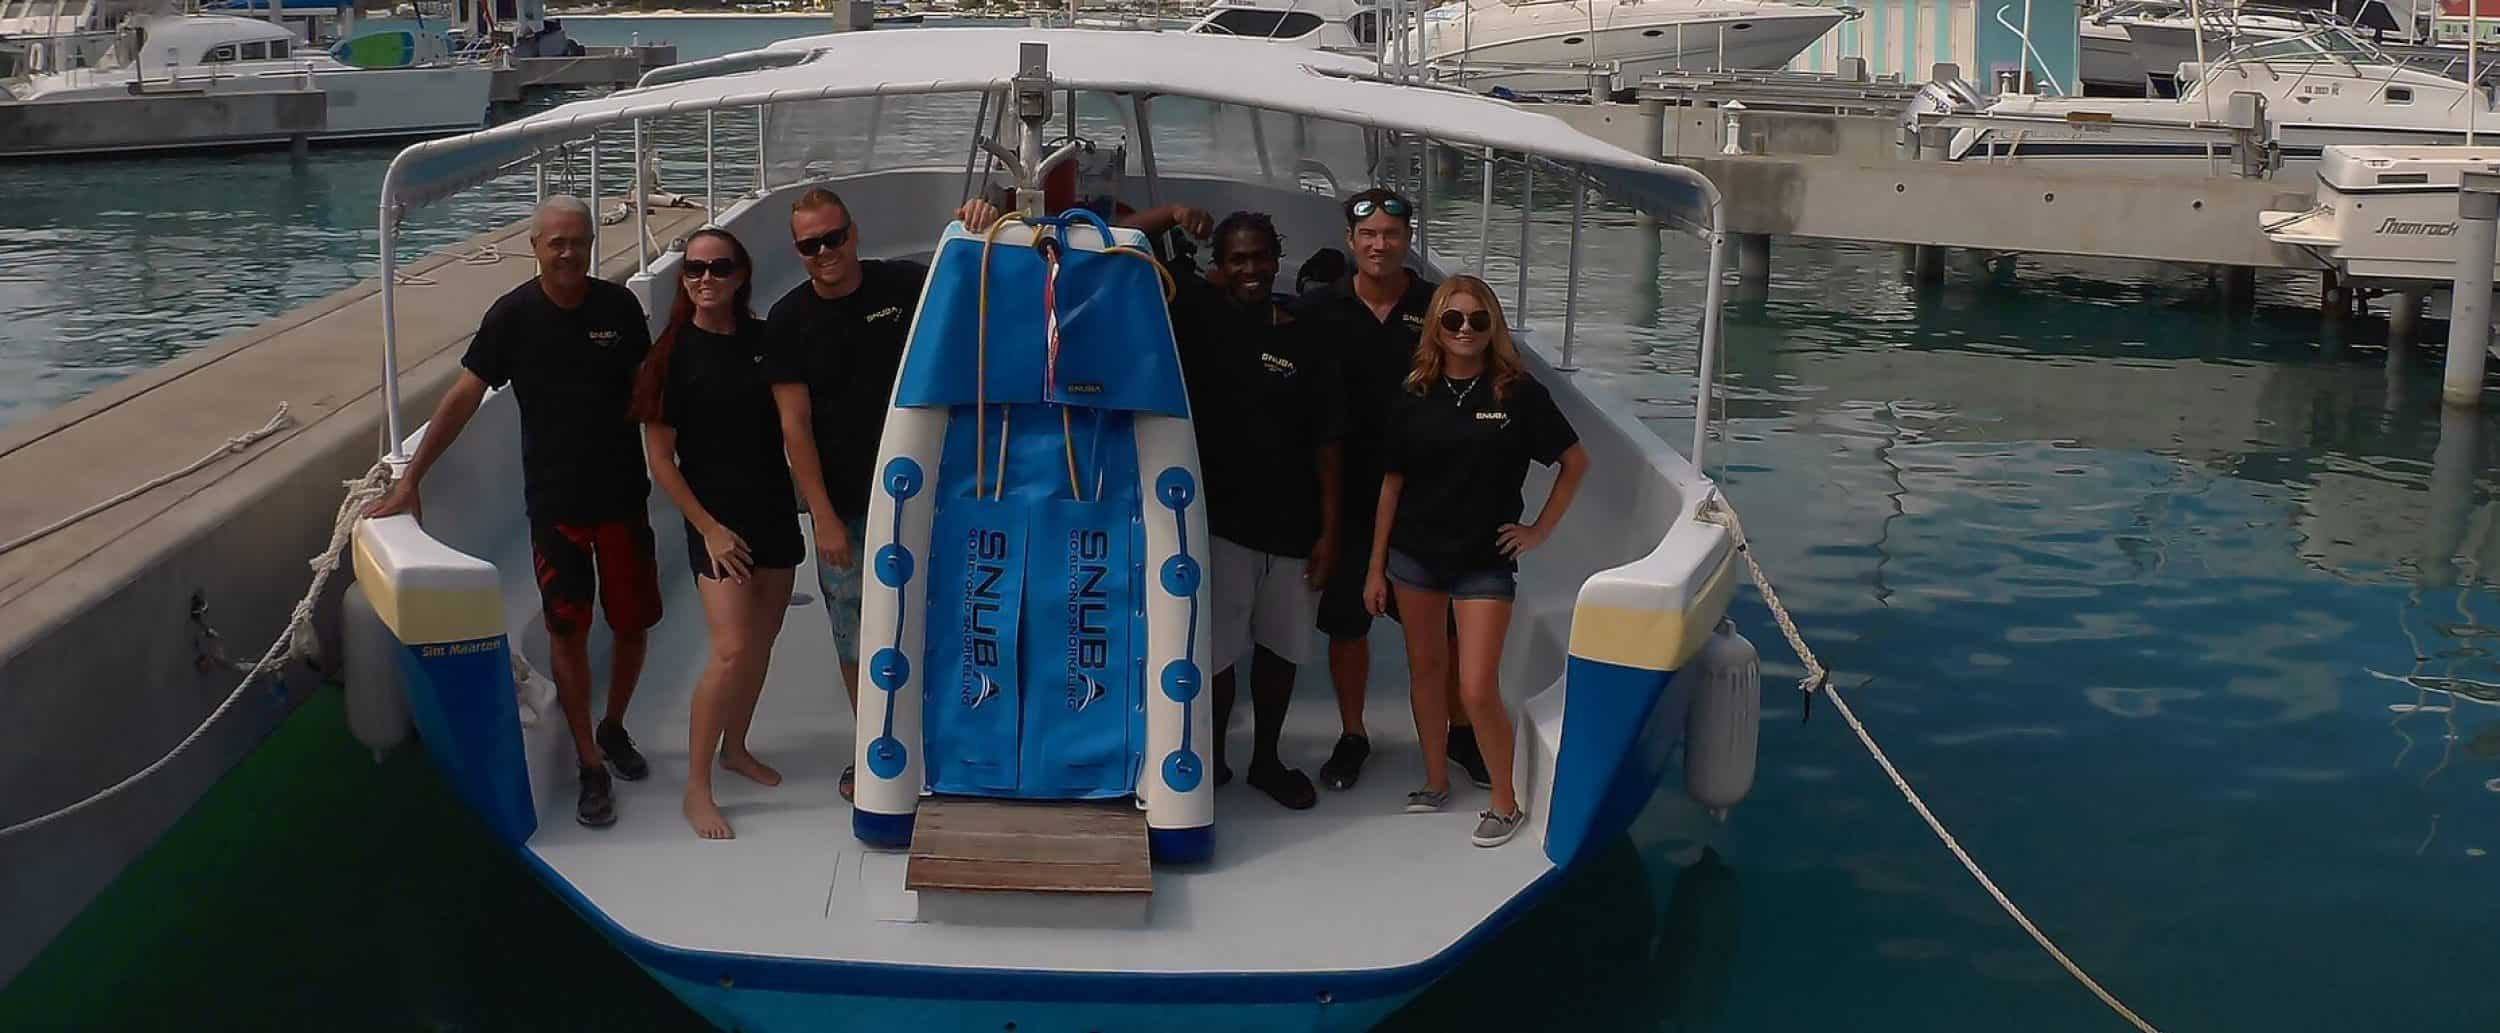 Snuba Sint Maarten – SXM